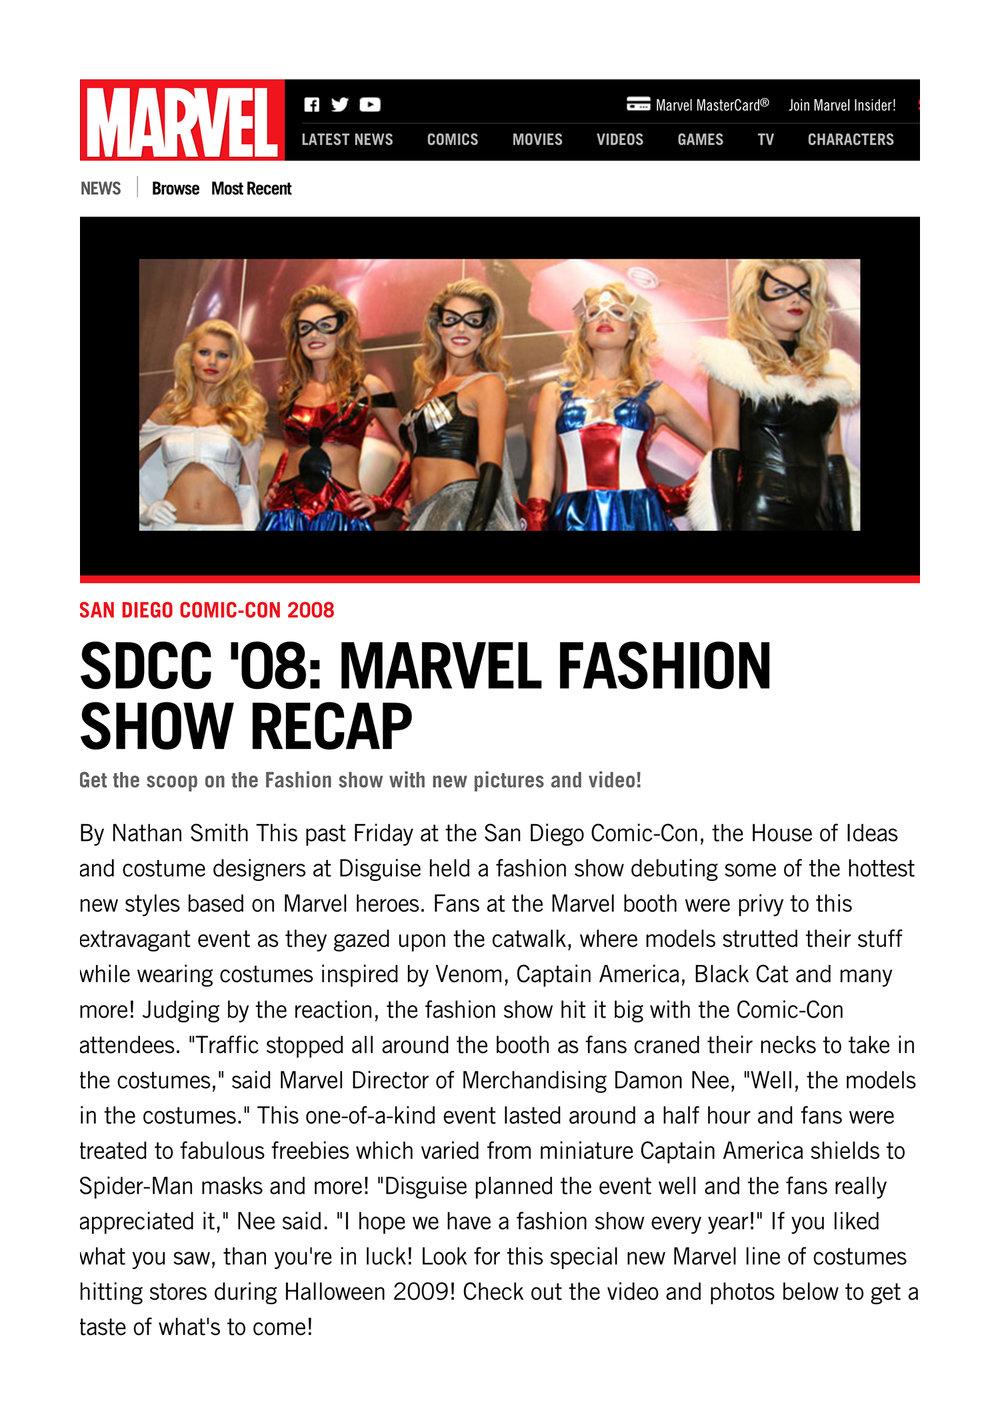 Entertainment_Women-of-Marvel-Fashion_Art_Director_Designer_Bryan_Barnes_1500_SL23.jpg